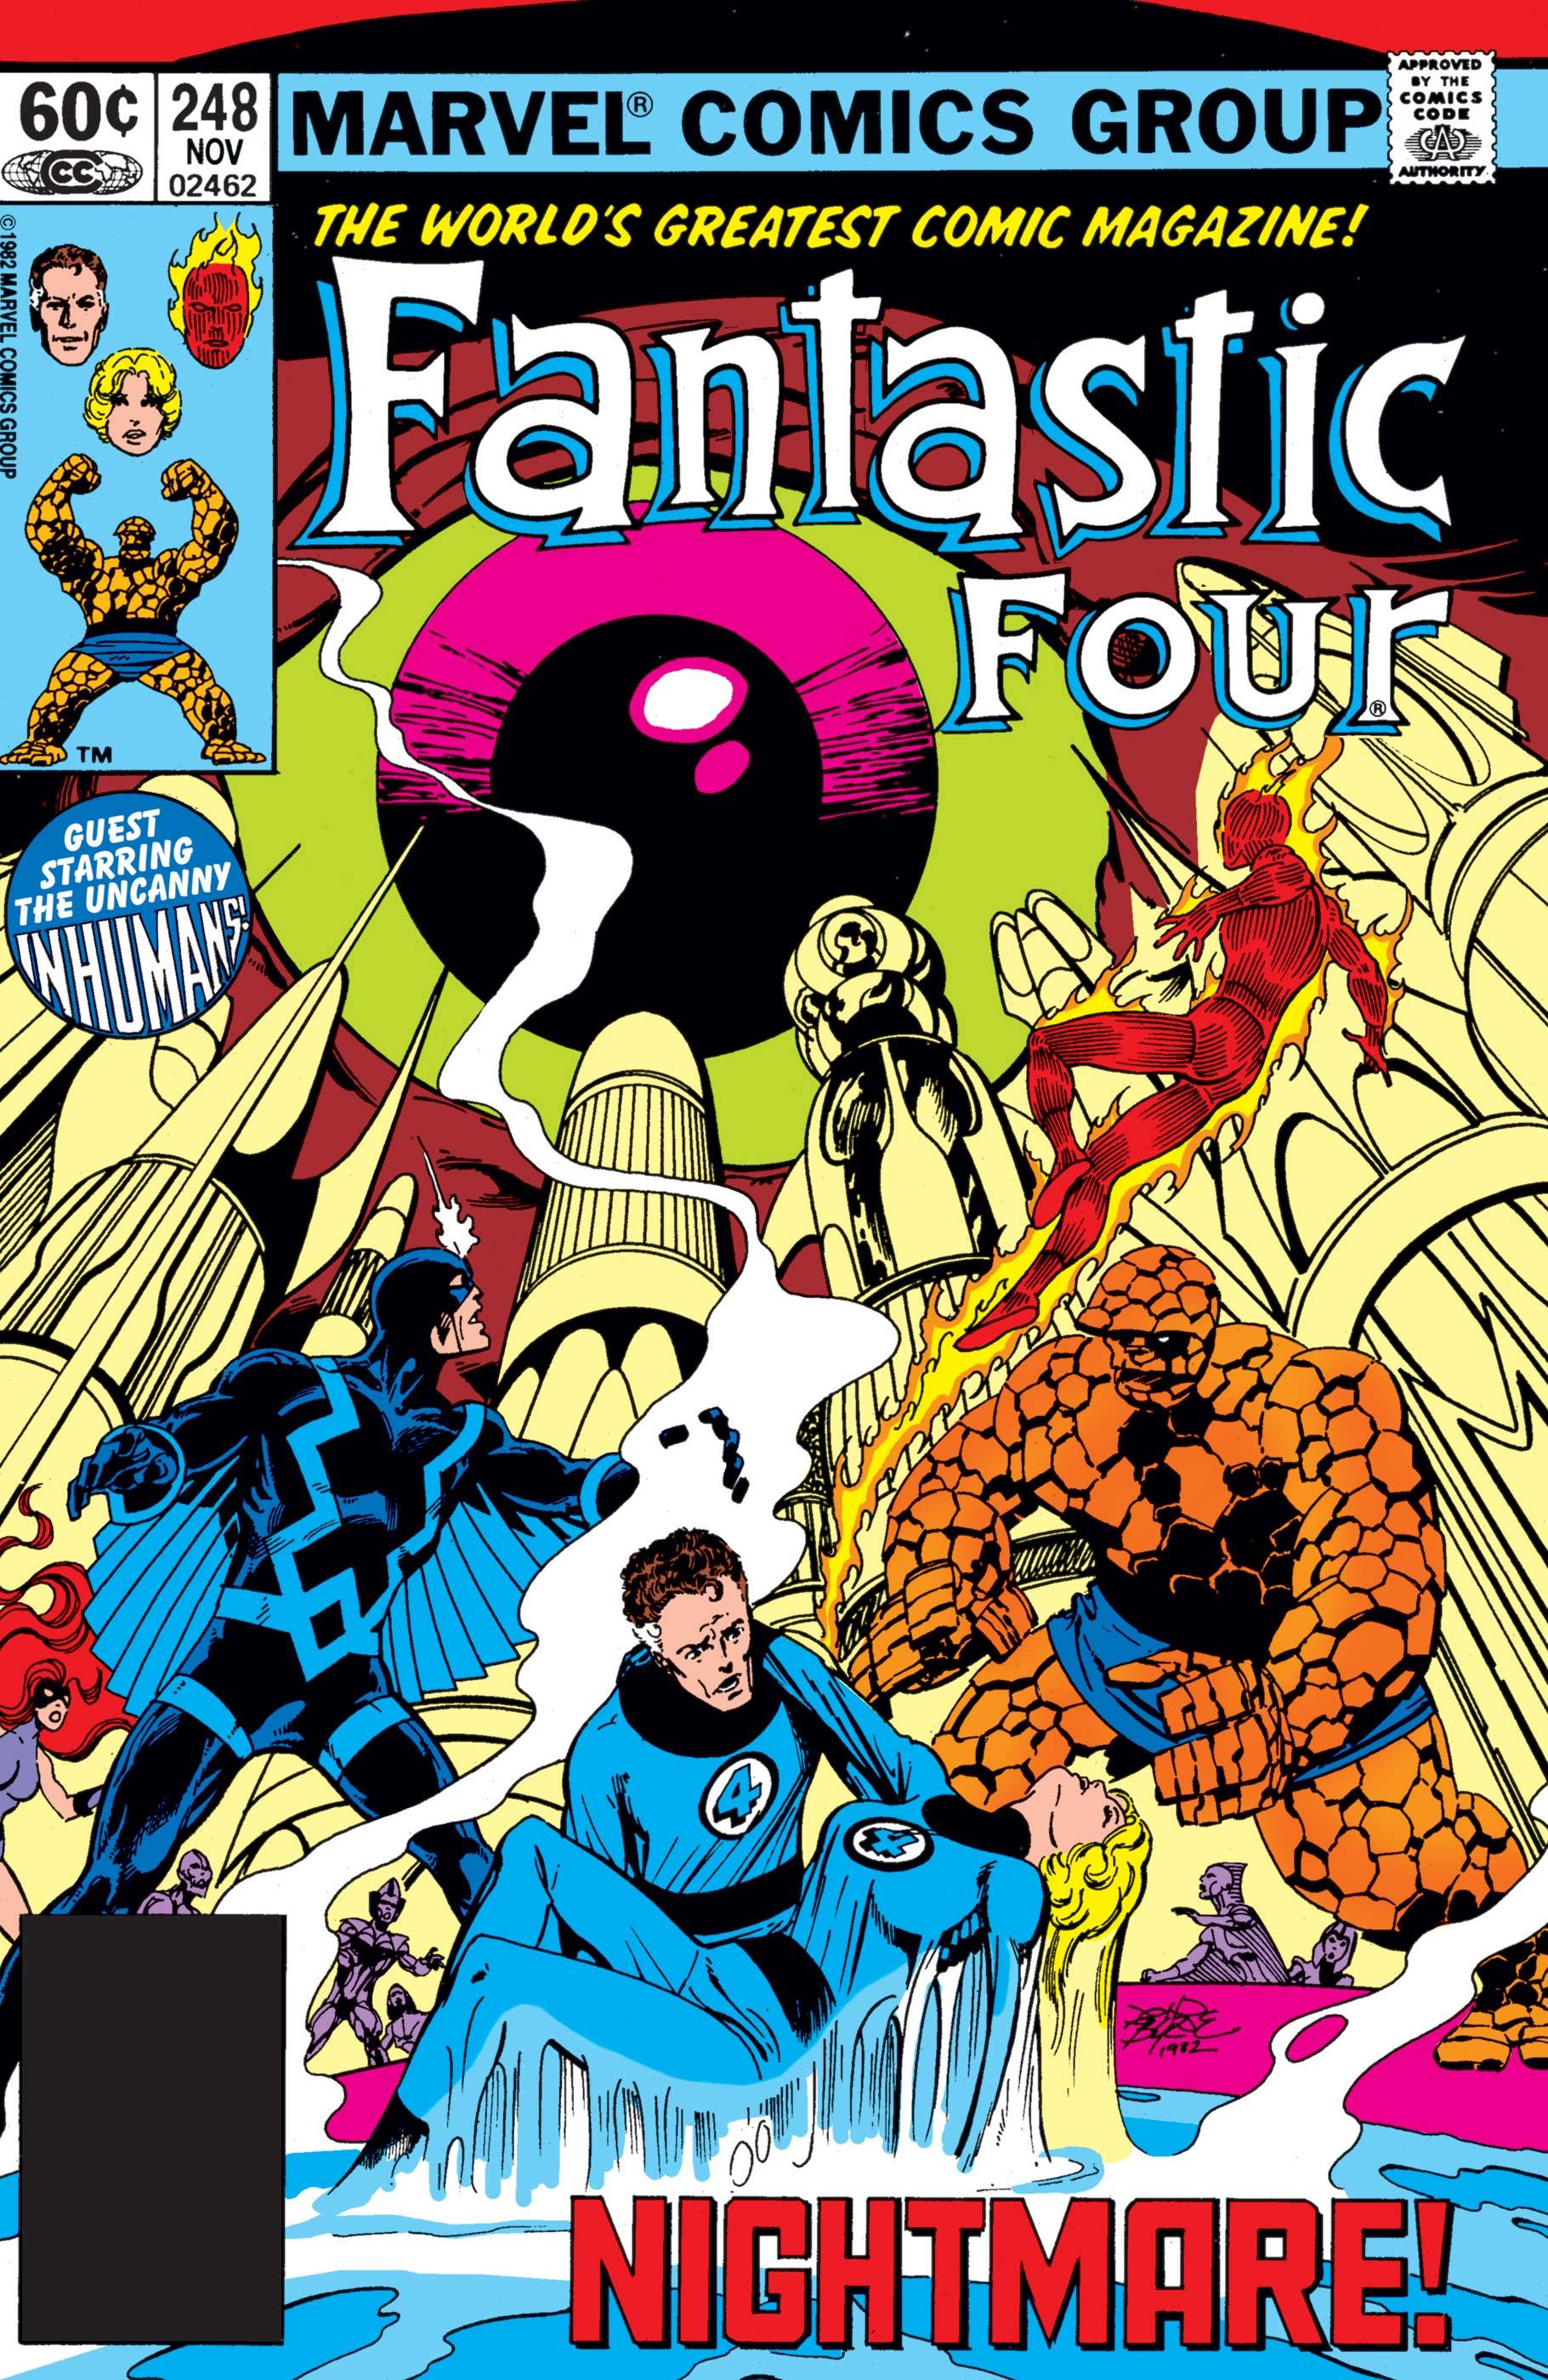 Fantastic Four (1961) #248